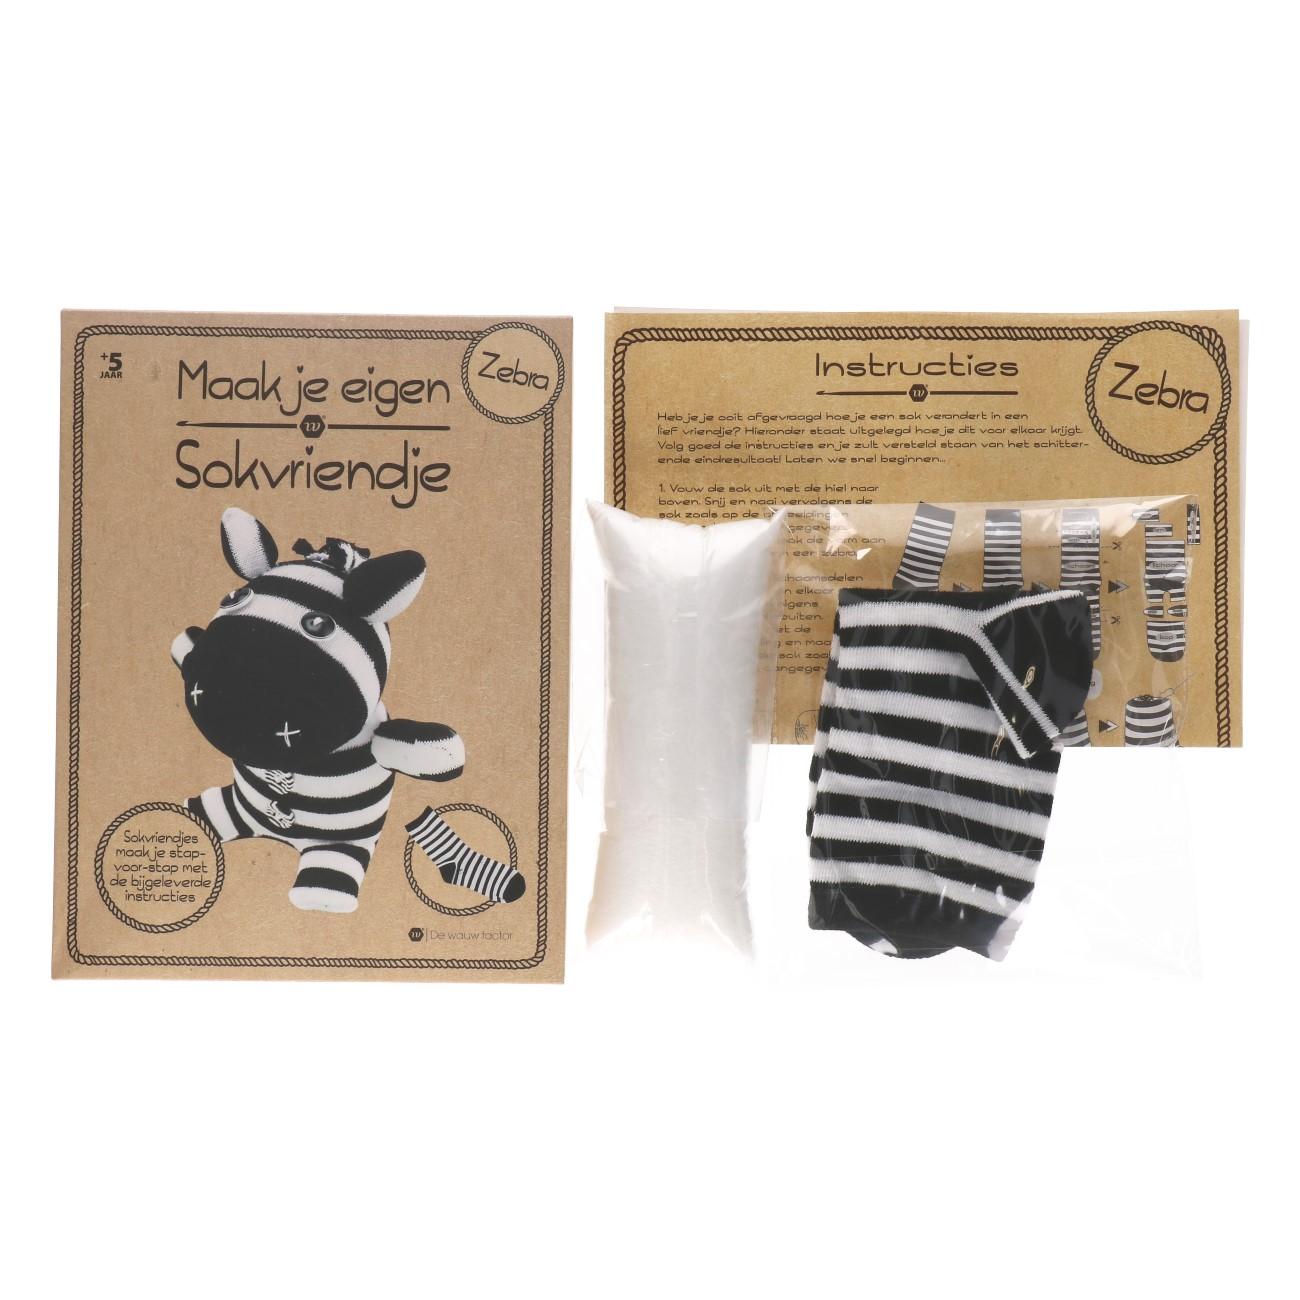 Maak je eigen sok zebra